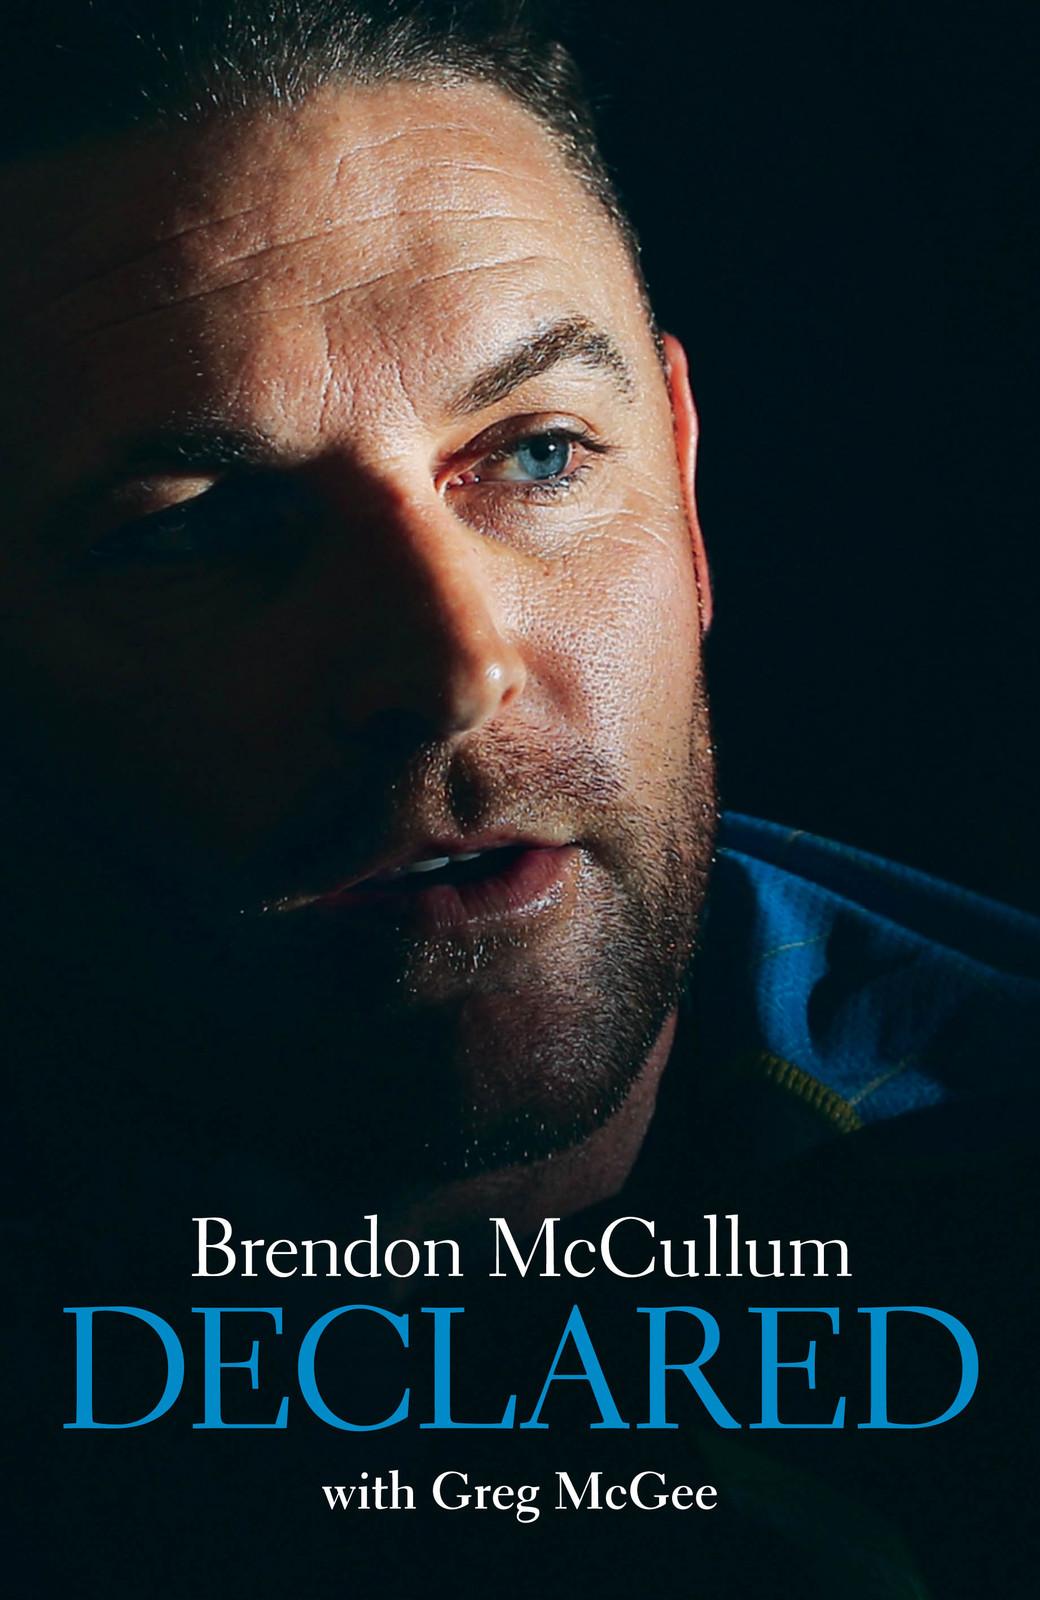 Brendon McCullum - Declared | Greg McGee Book | In-Stock ...